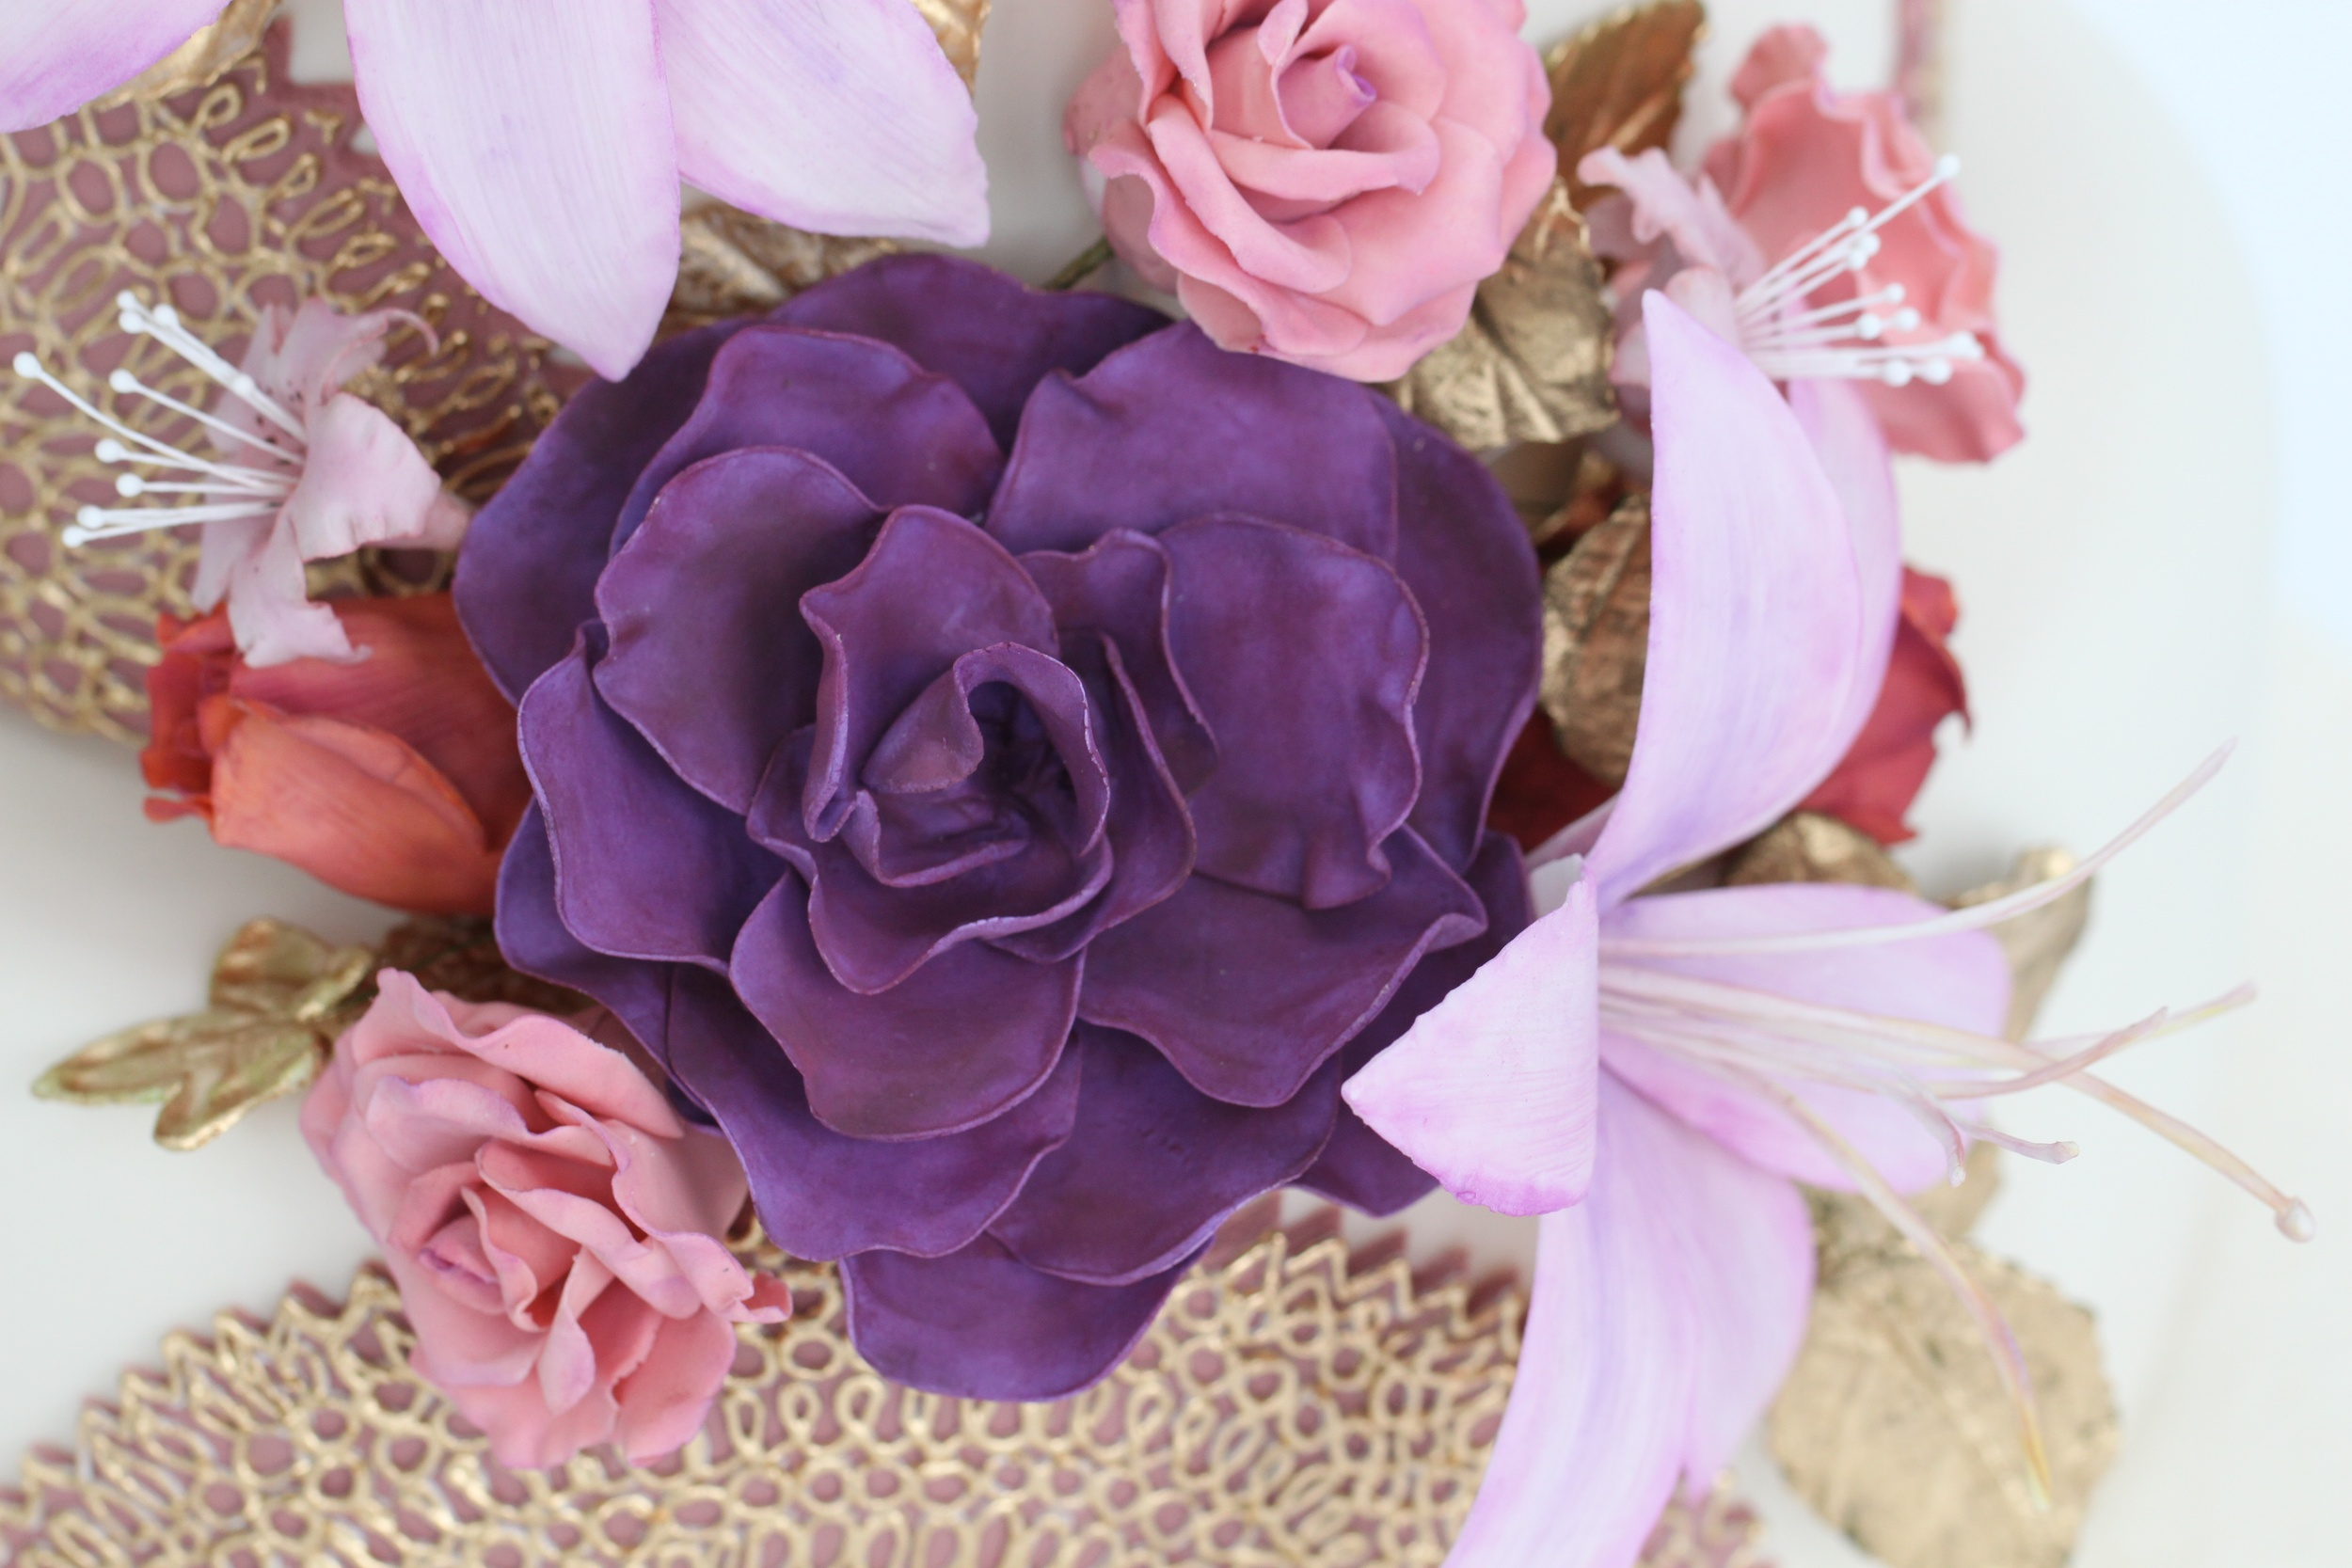 Henna insp floral wedding floral close 7431.jpg